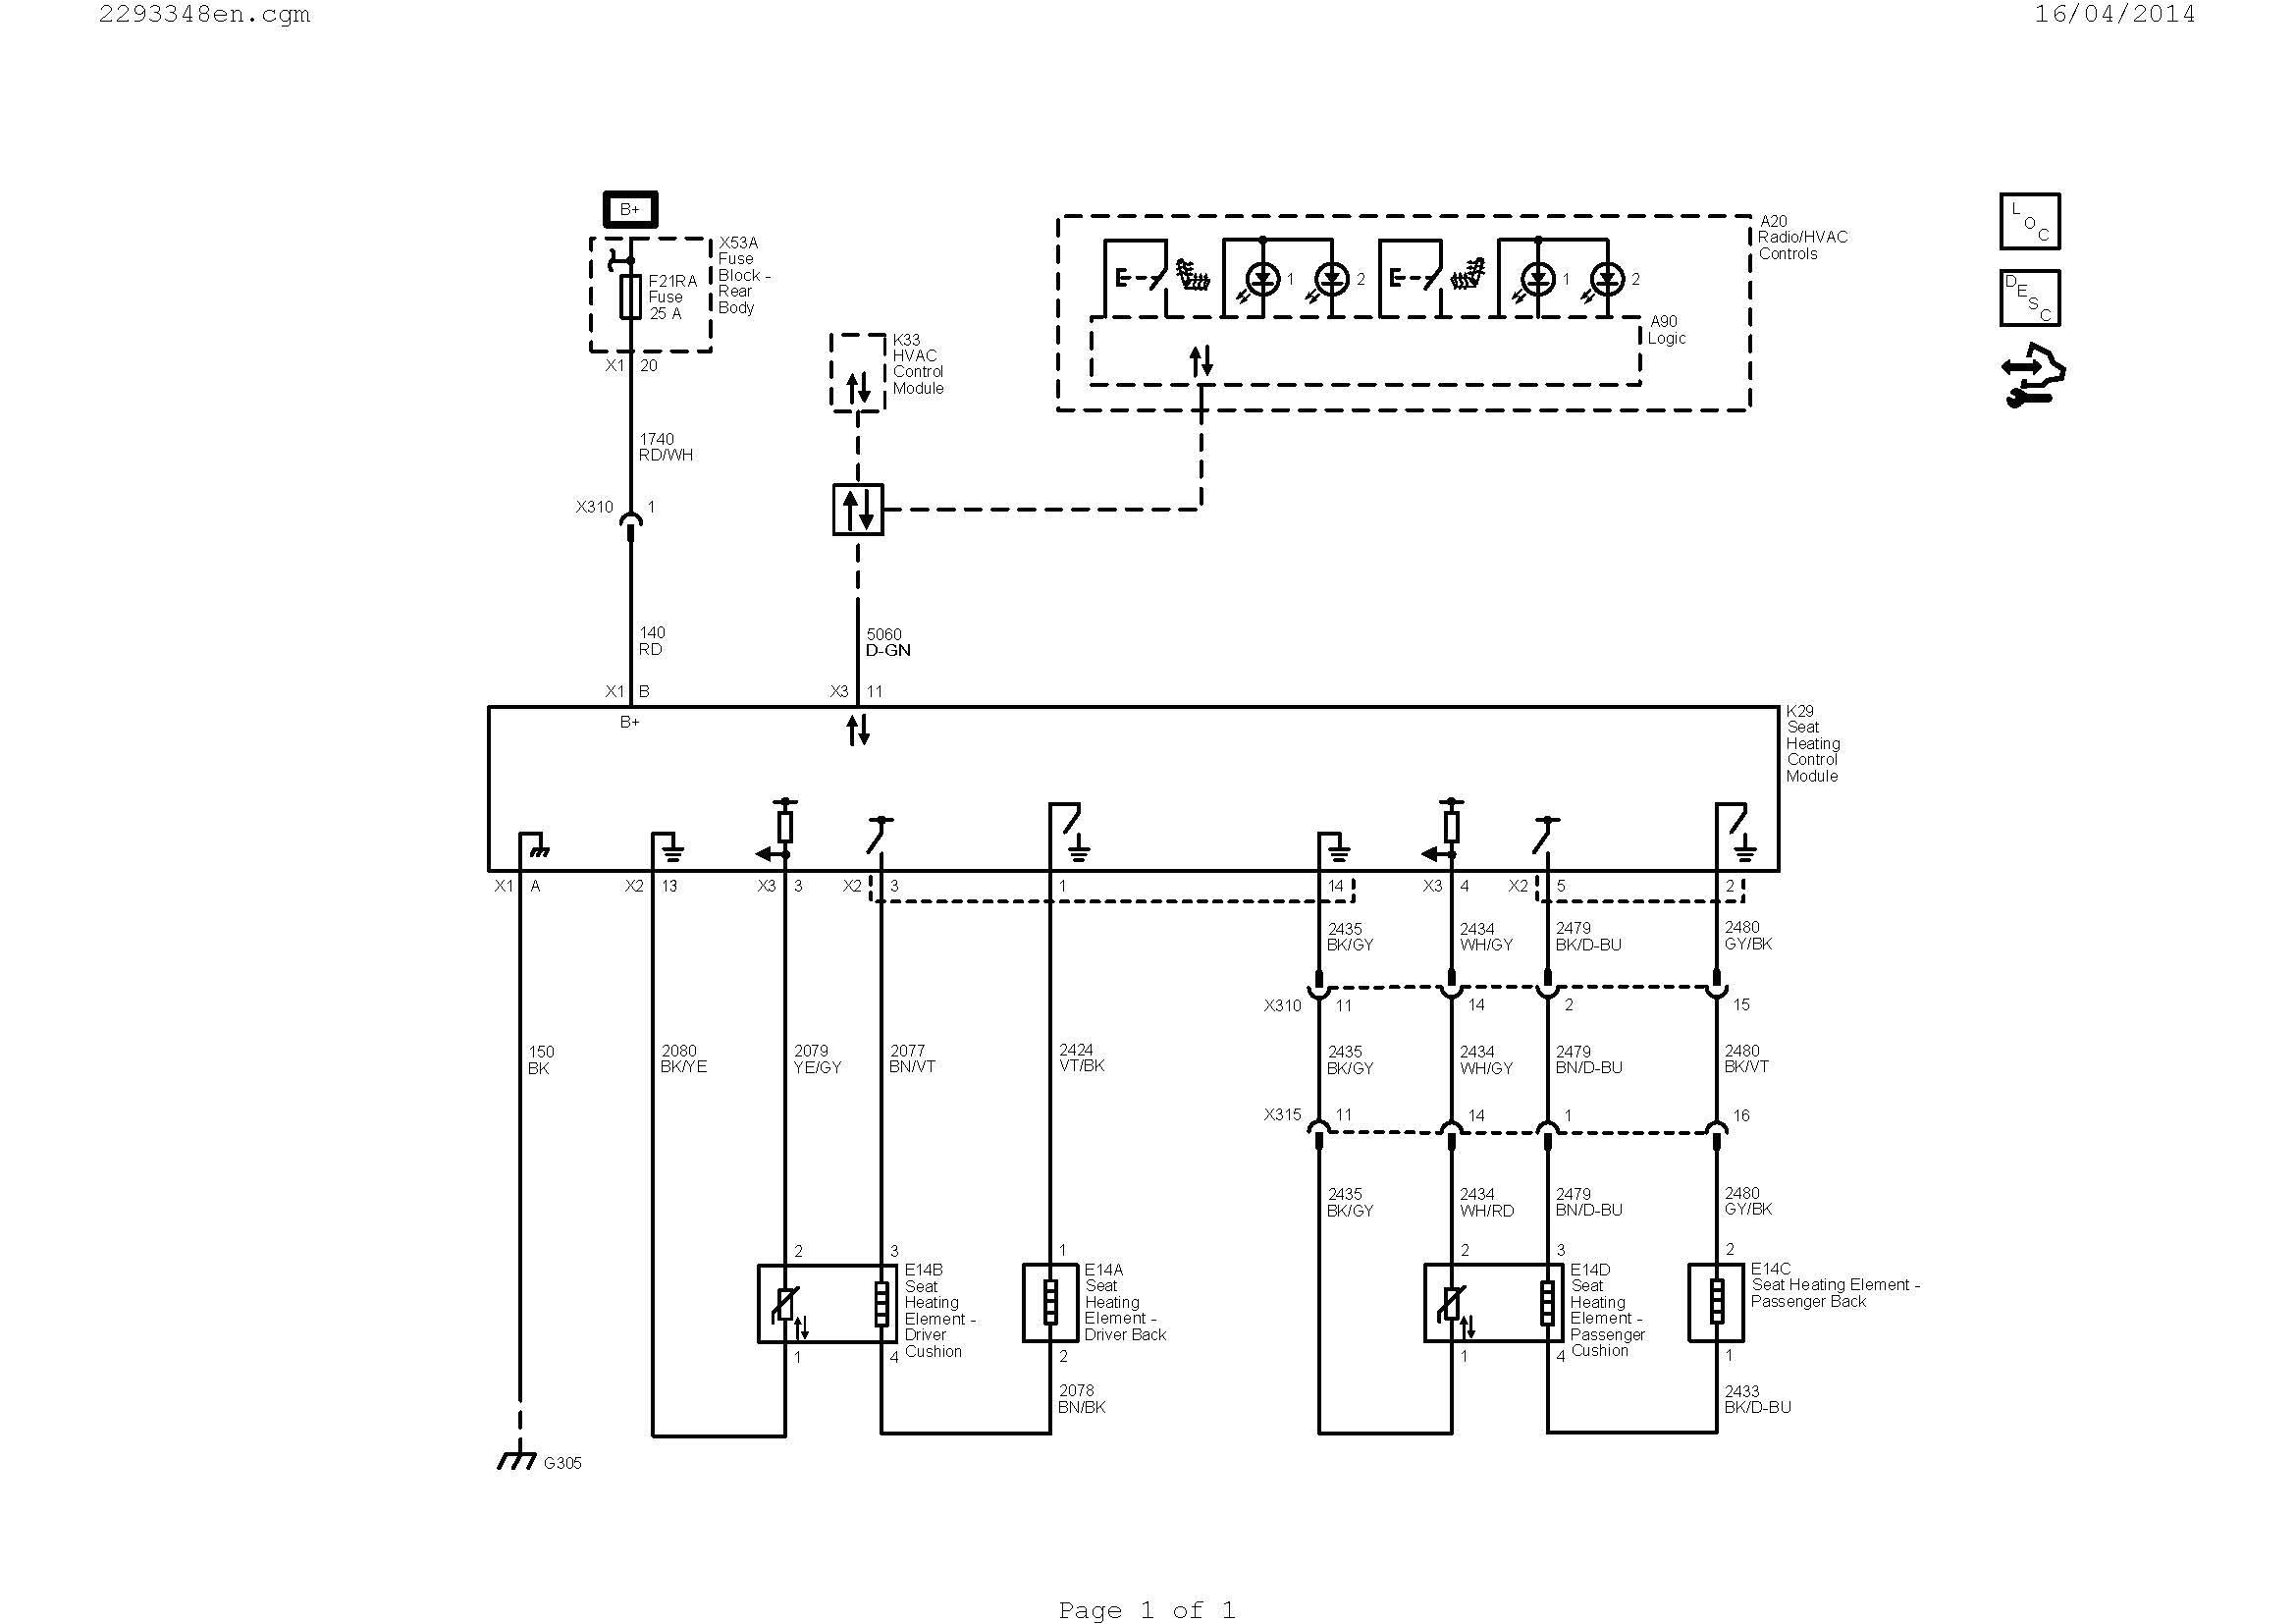 rv park wiring diagram wiring diagram blog home wiring diagrams rv park wiring diagram fleetwood fiesta